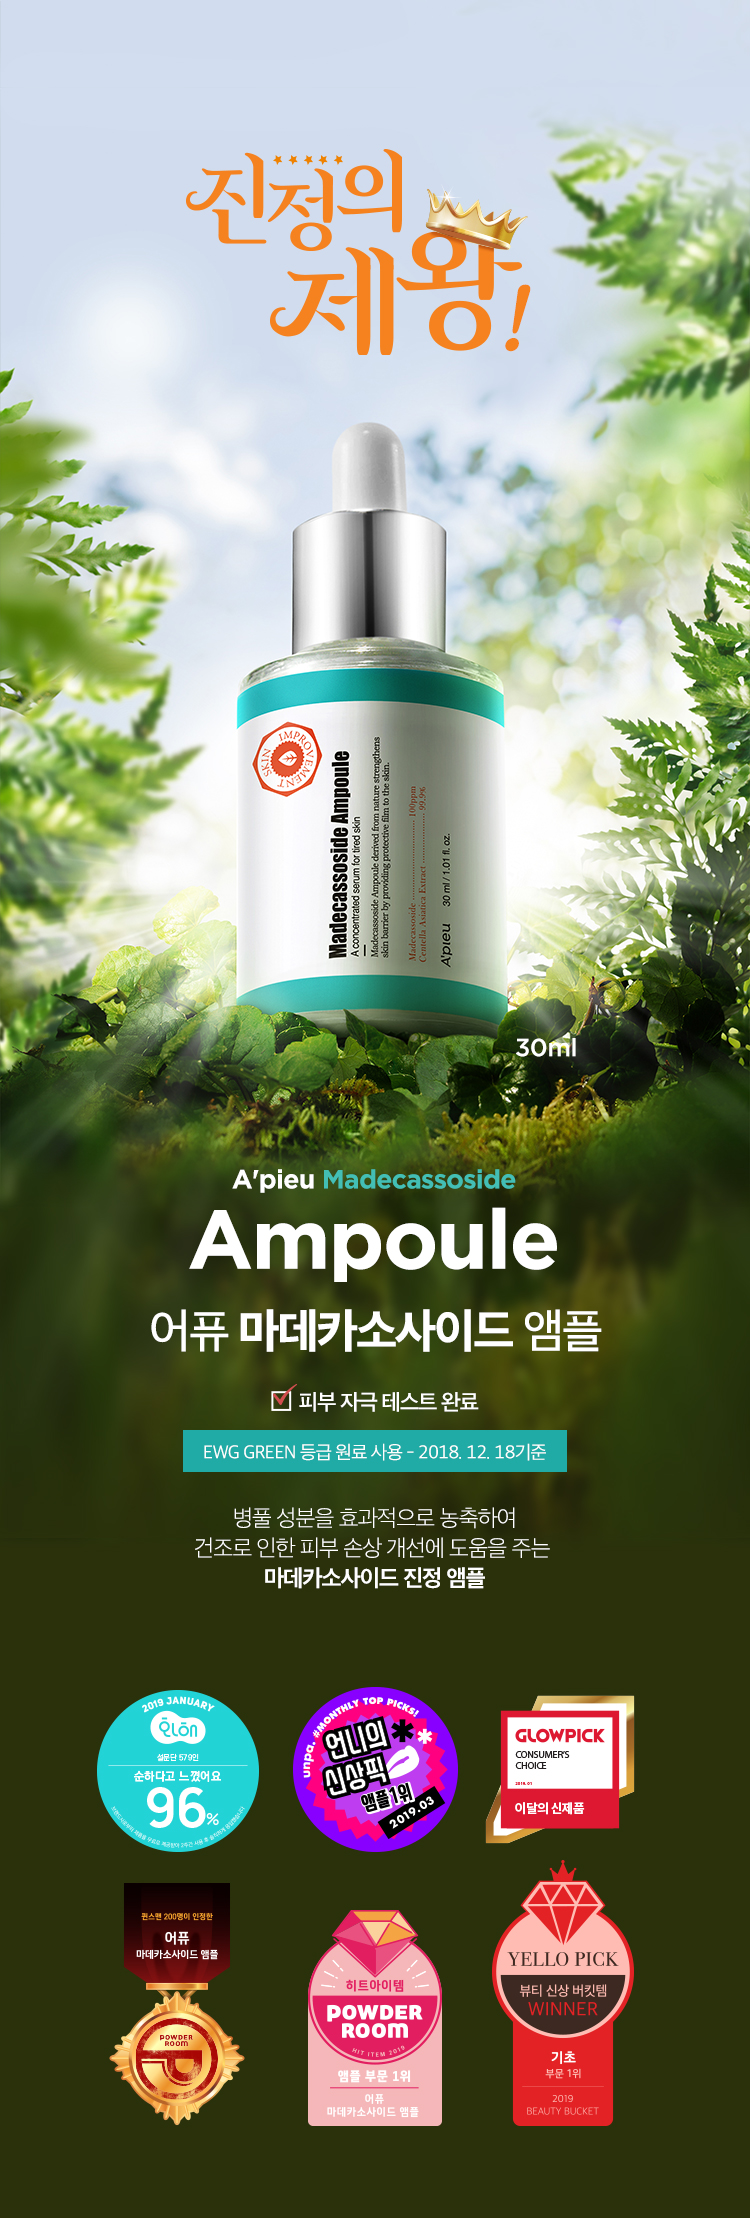 apieu_madecassoside_ampoule_emblem_02.jpg